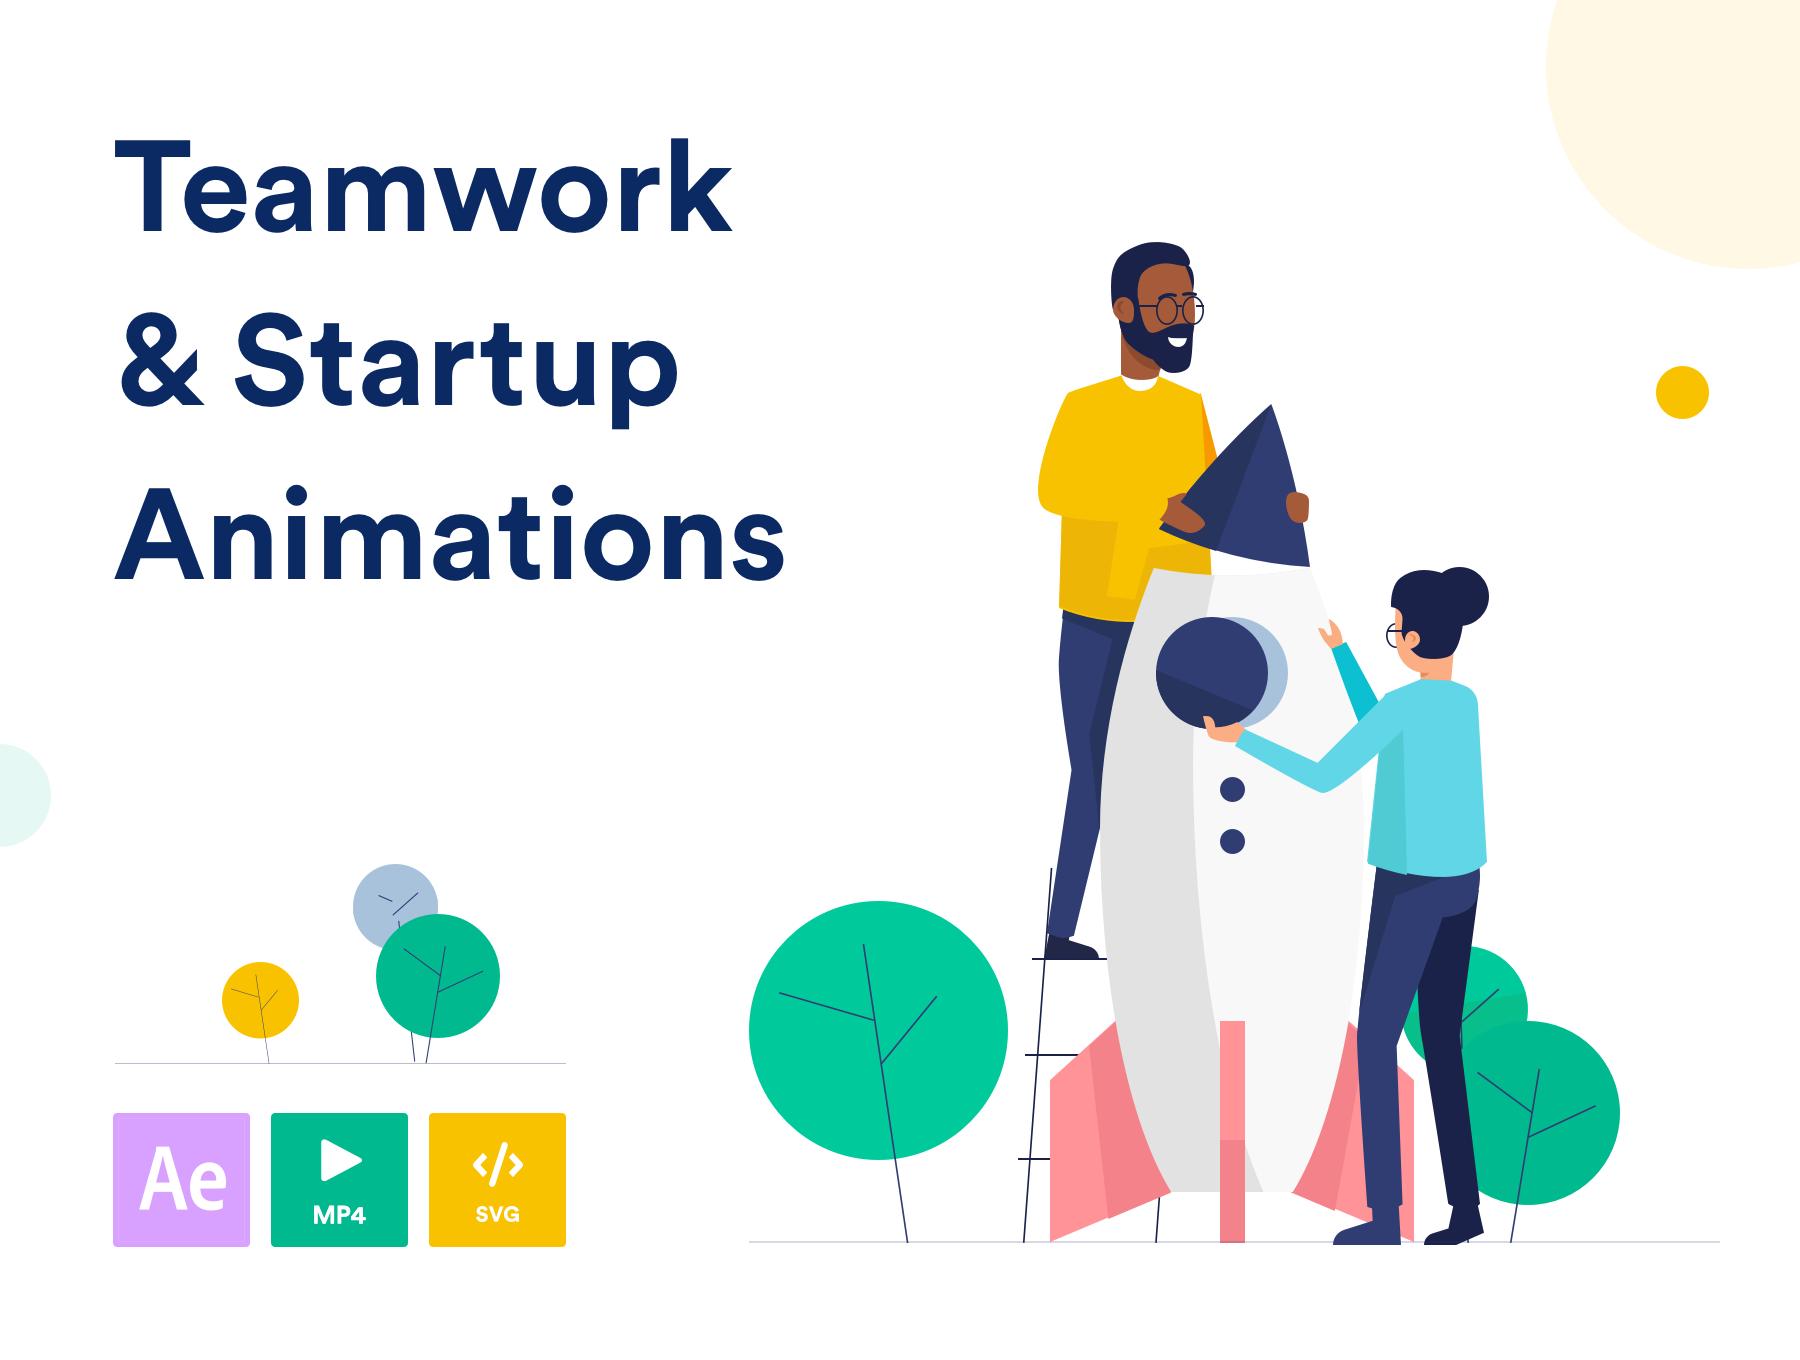 <span class='yzk_title_64596'>Teamwork & Startup Animations</span>